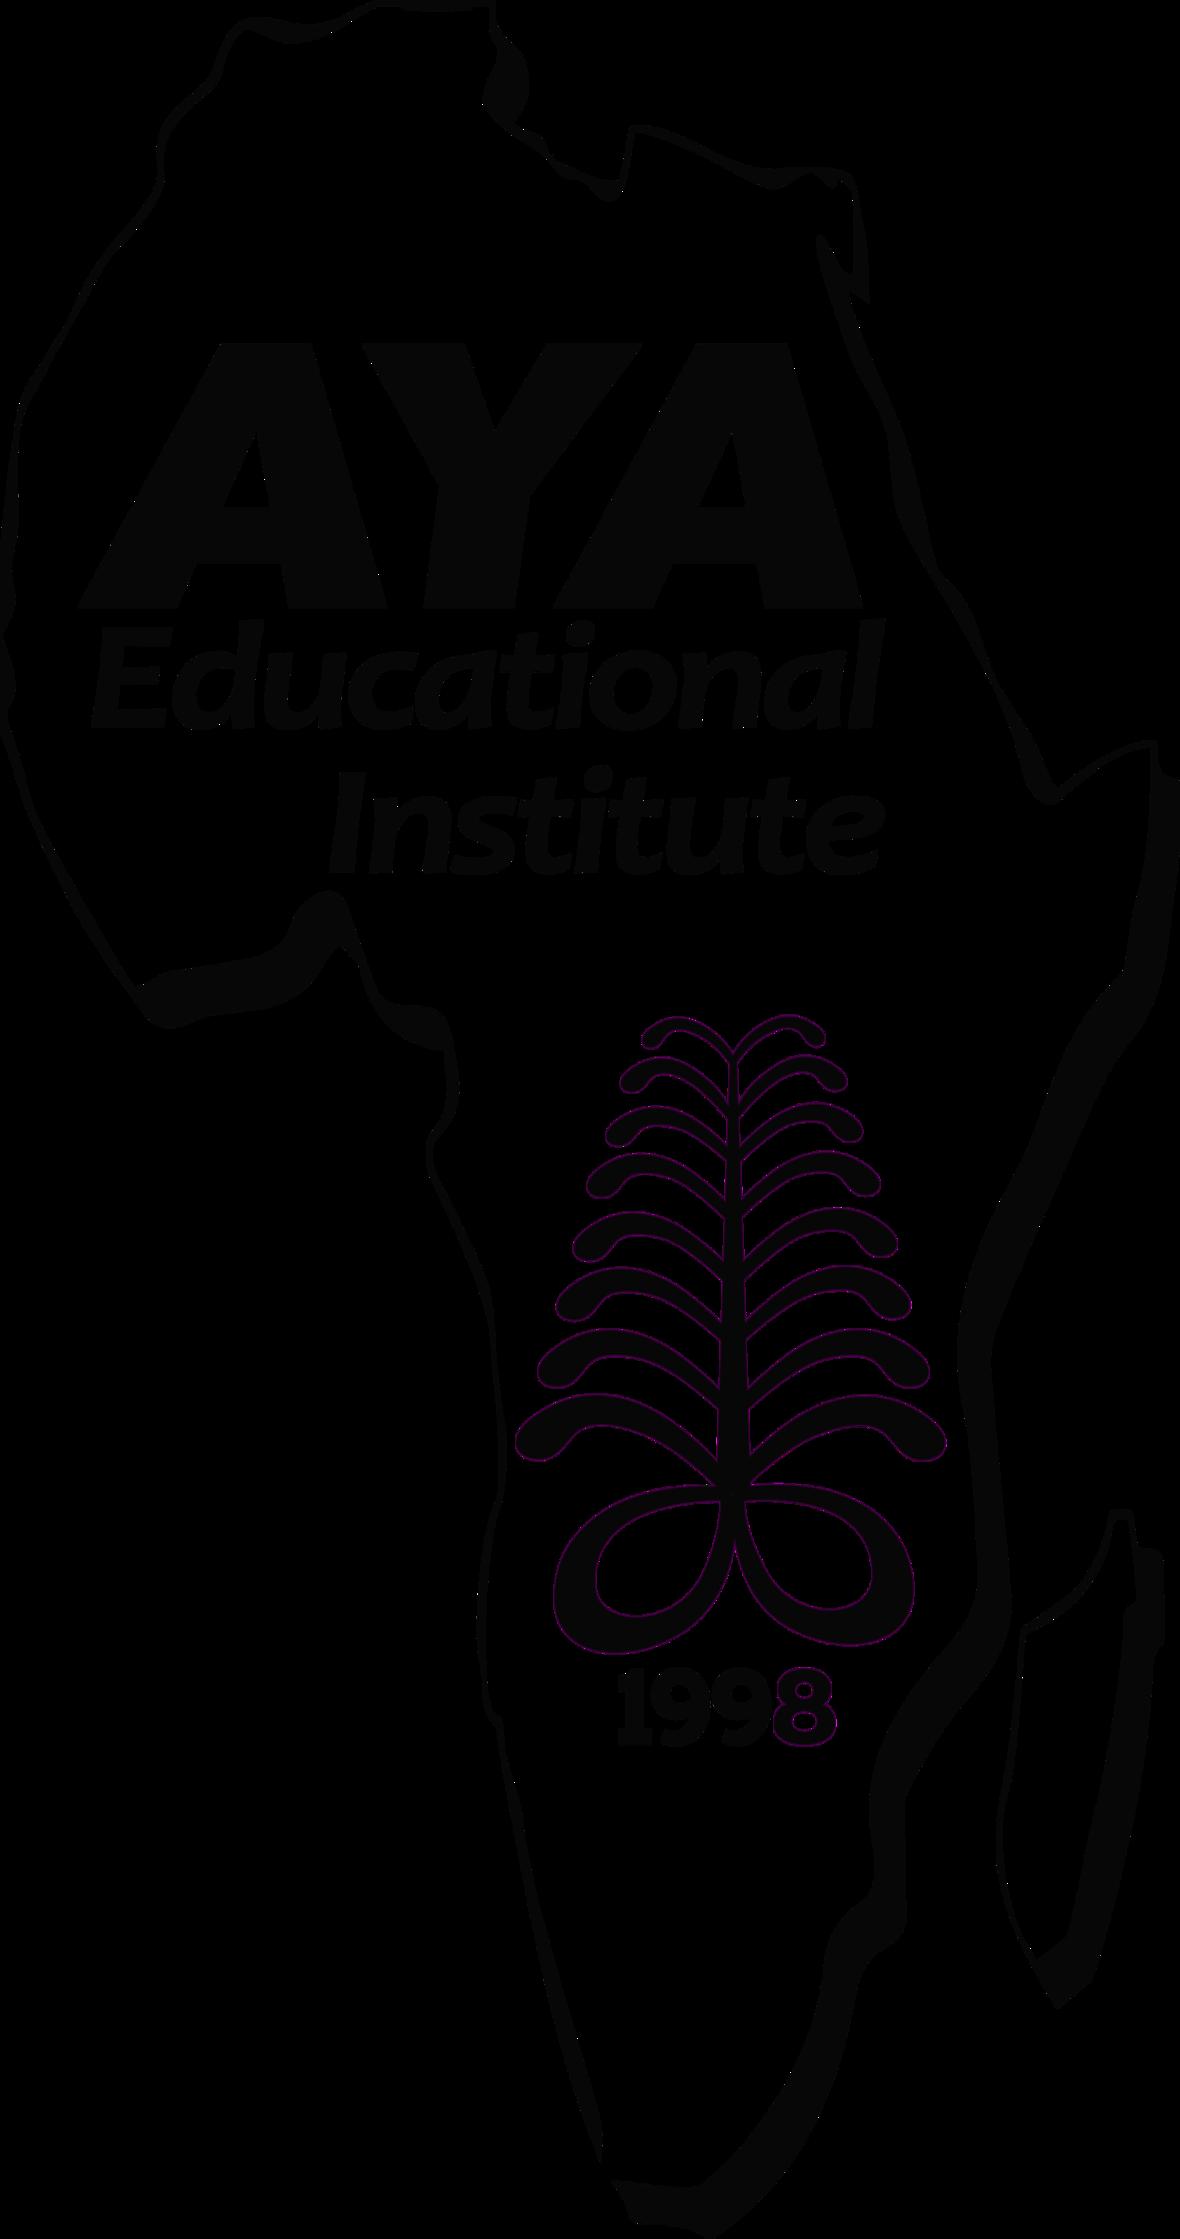 aya logo vector 2016